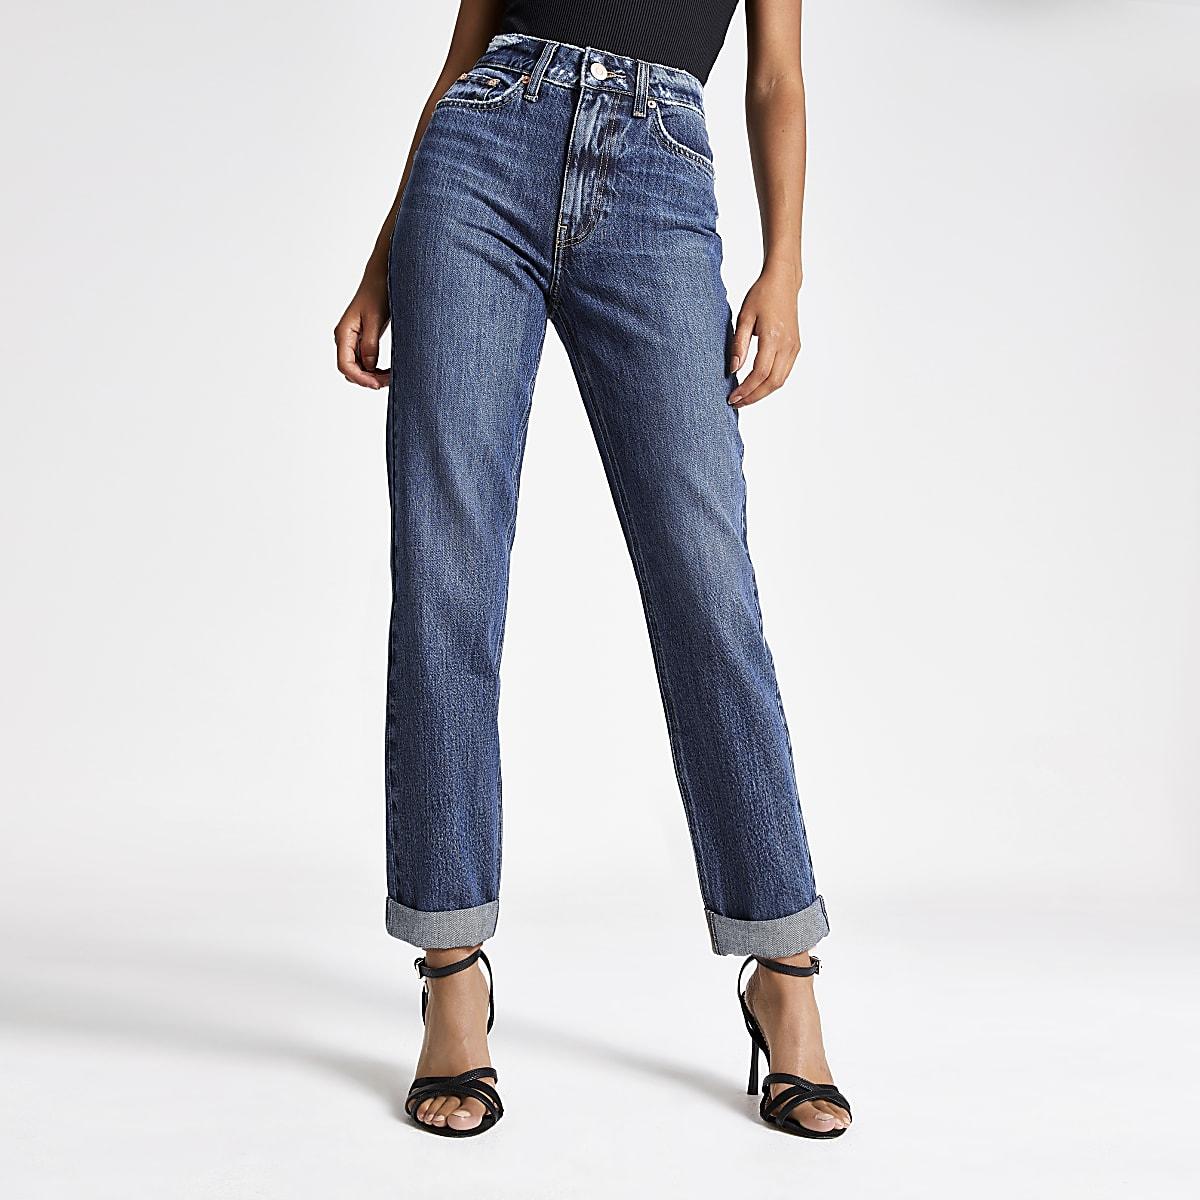 Dark blue high rise Mom jeans